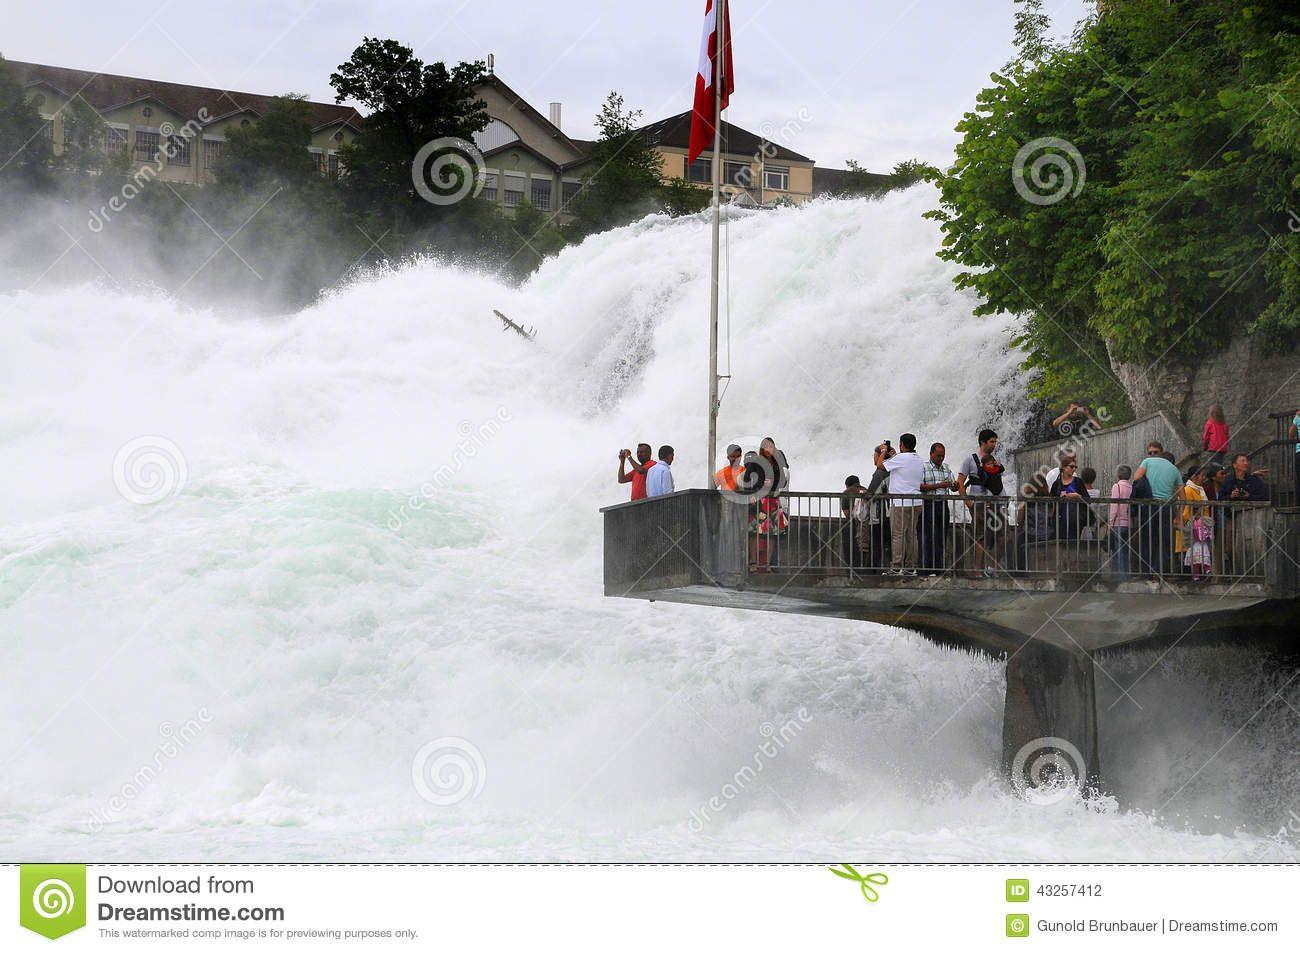 rhine-falls-famous-schaffhausen-switzerland-boats-will-take-you-to-rocks-you-standing-right-43257412.jpg (1300×953)